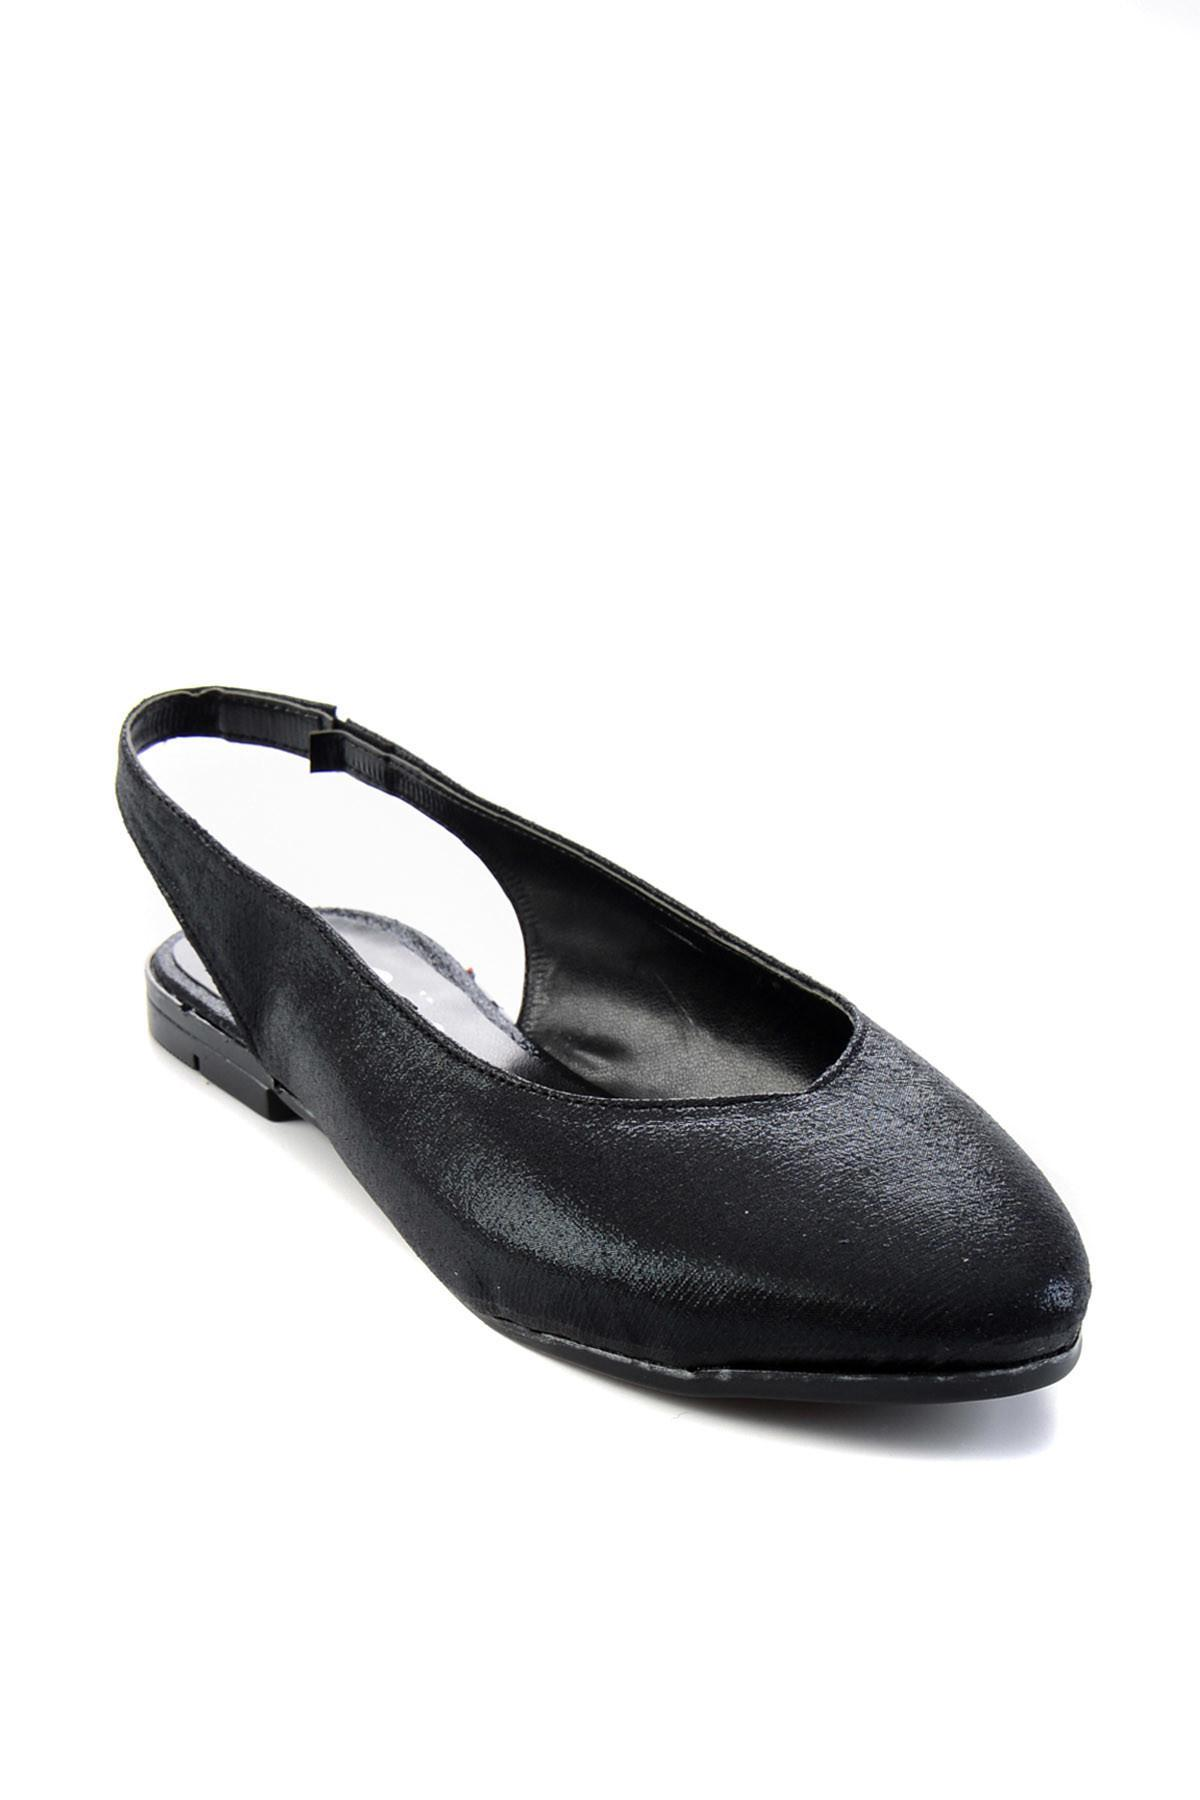 Bambi Black Women Ballerina H0532300078